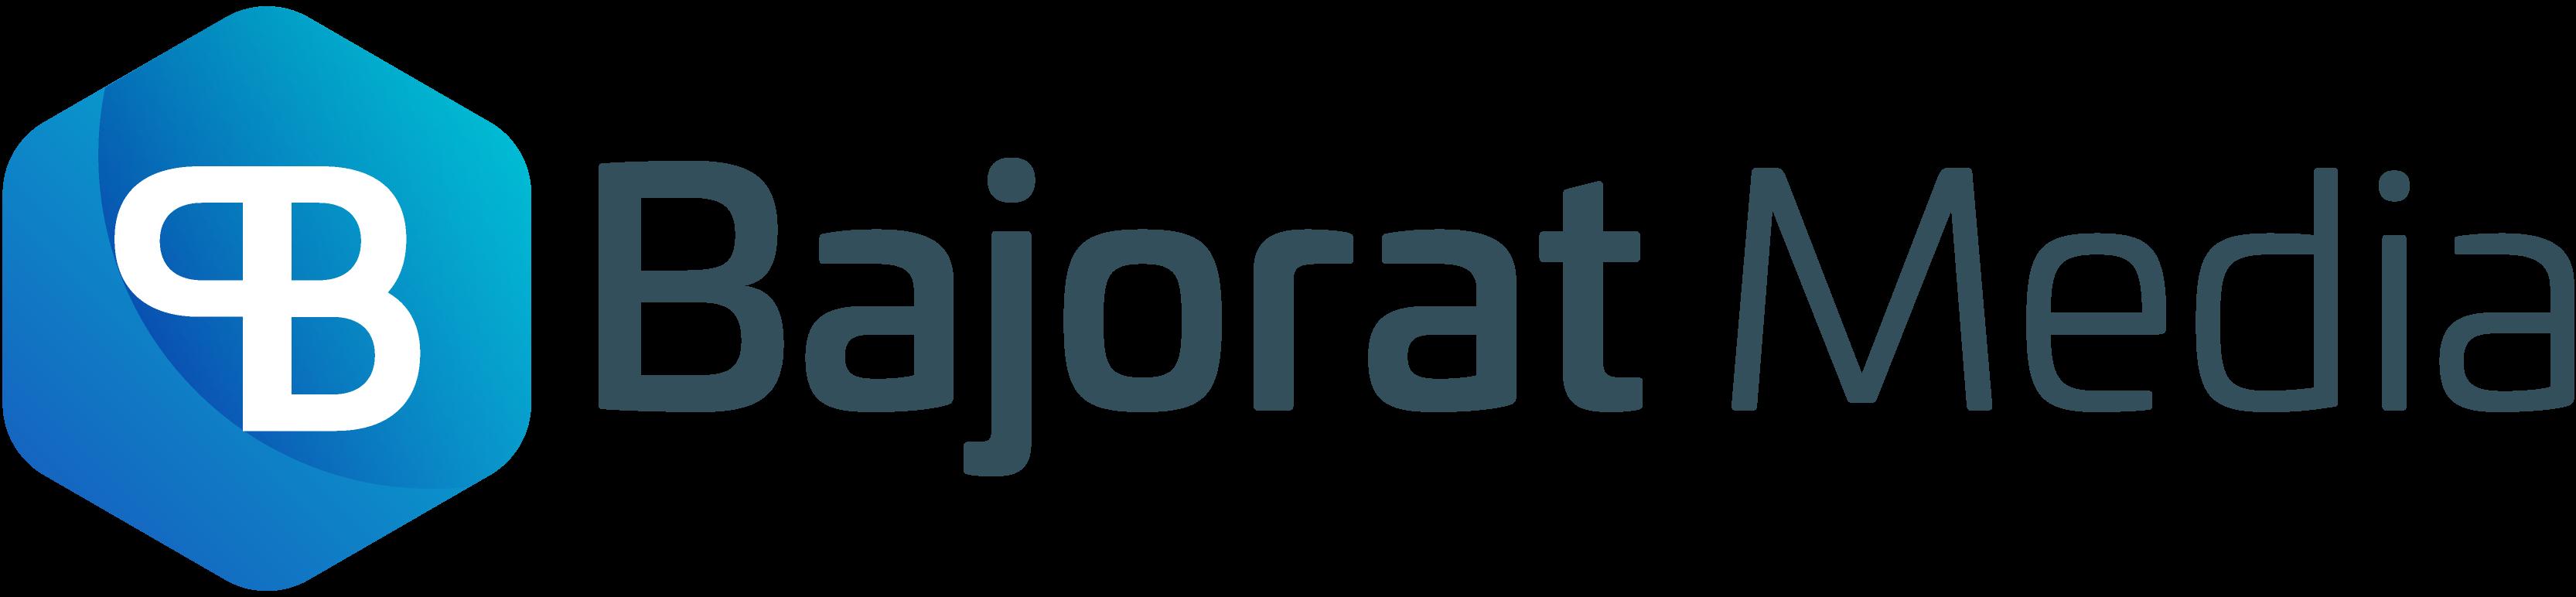 Bajorat-Media.com